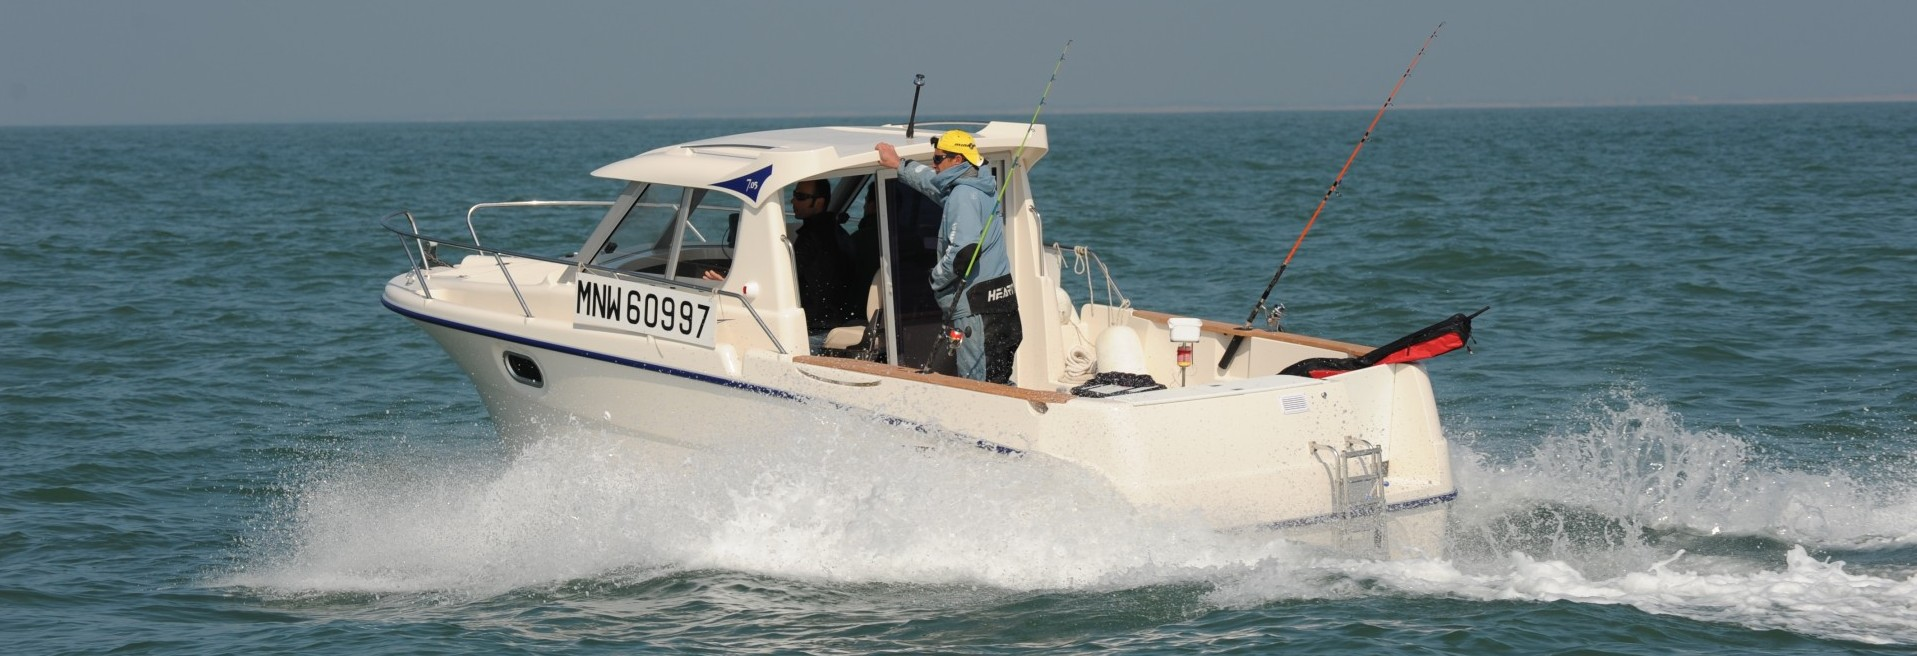 bateau peche en mer occasion